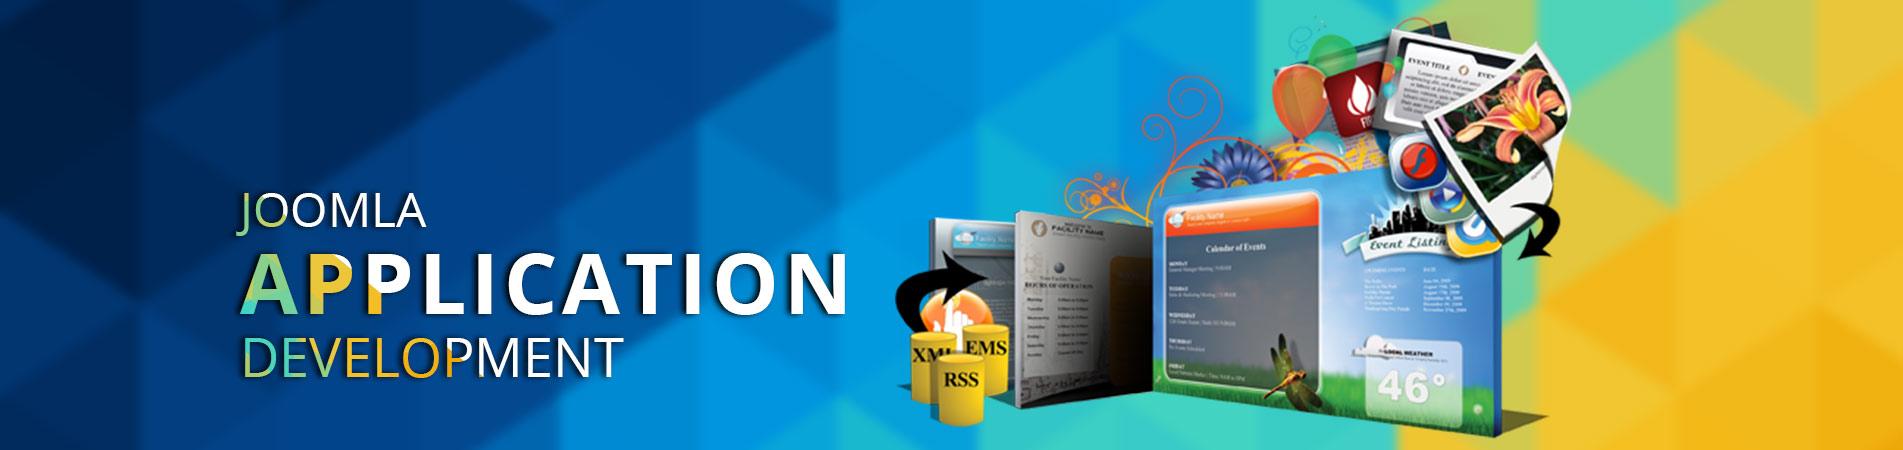 Joomla Application Development In Bangalore